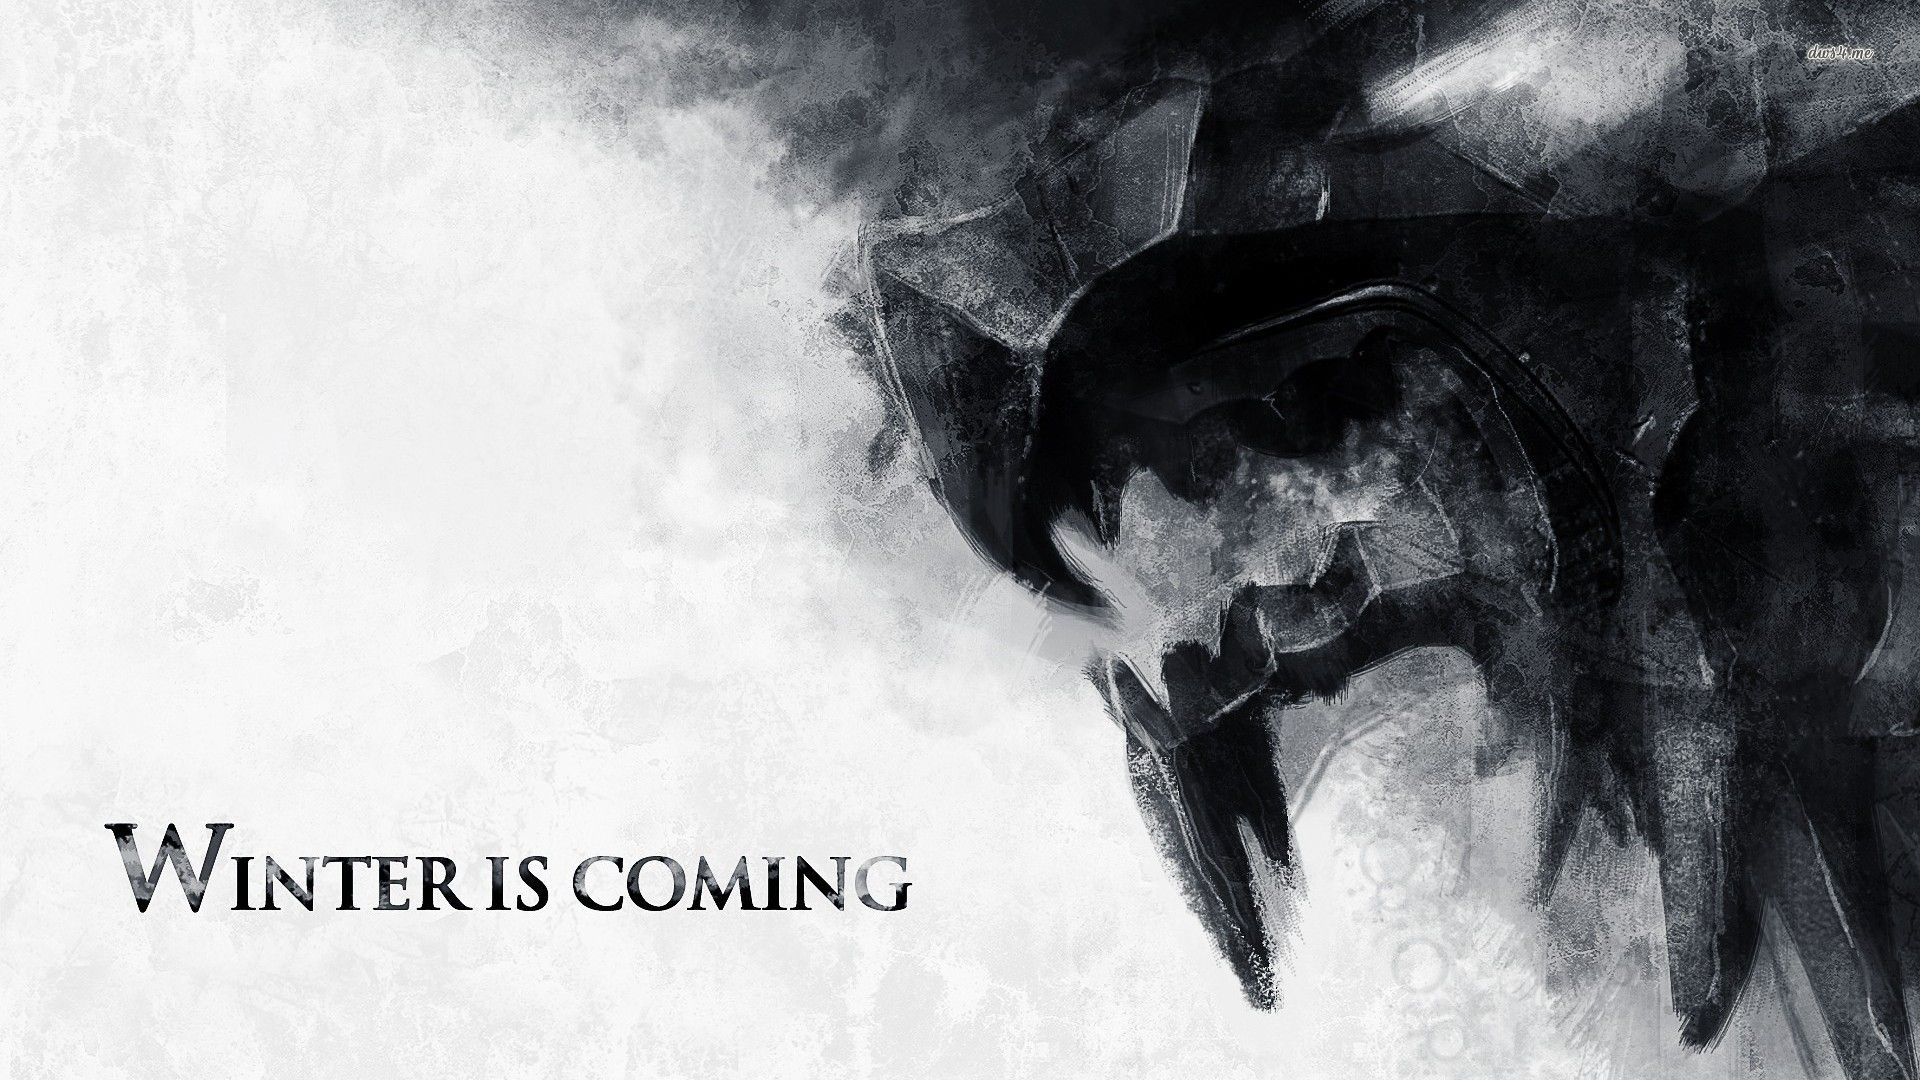 Game of Thrones Dragon art